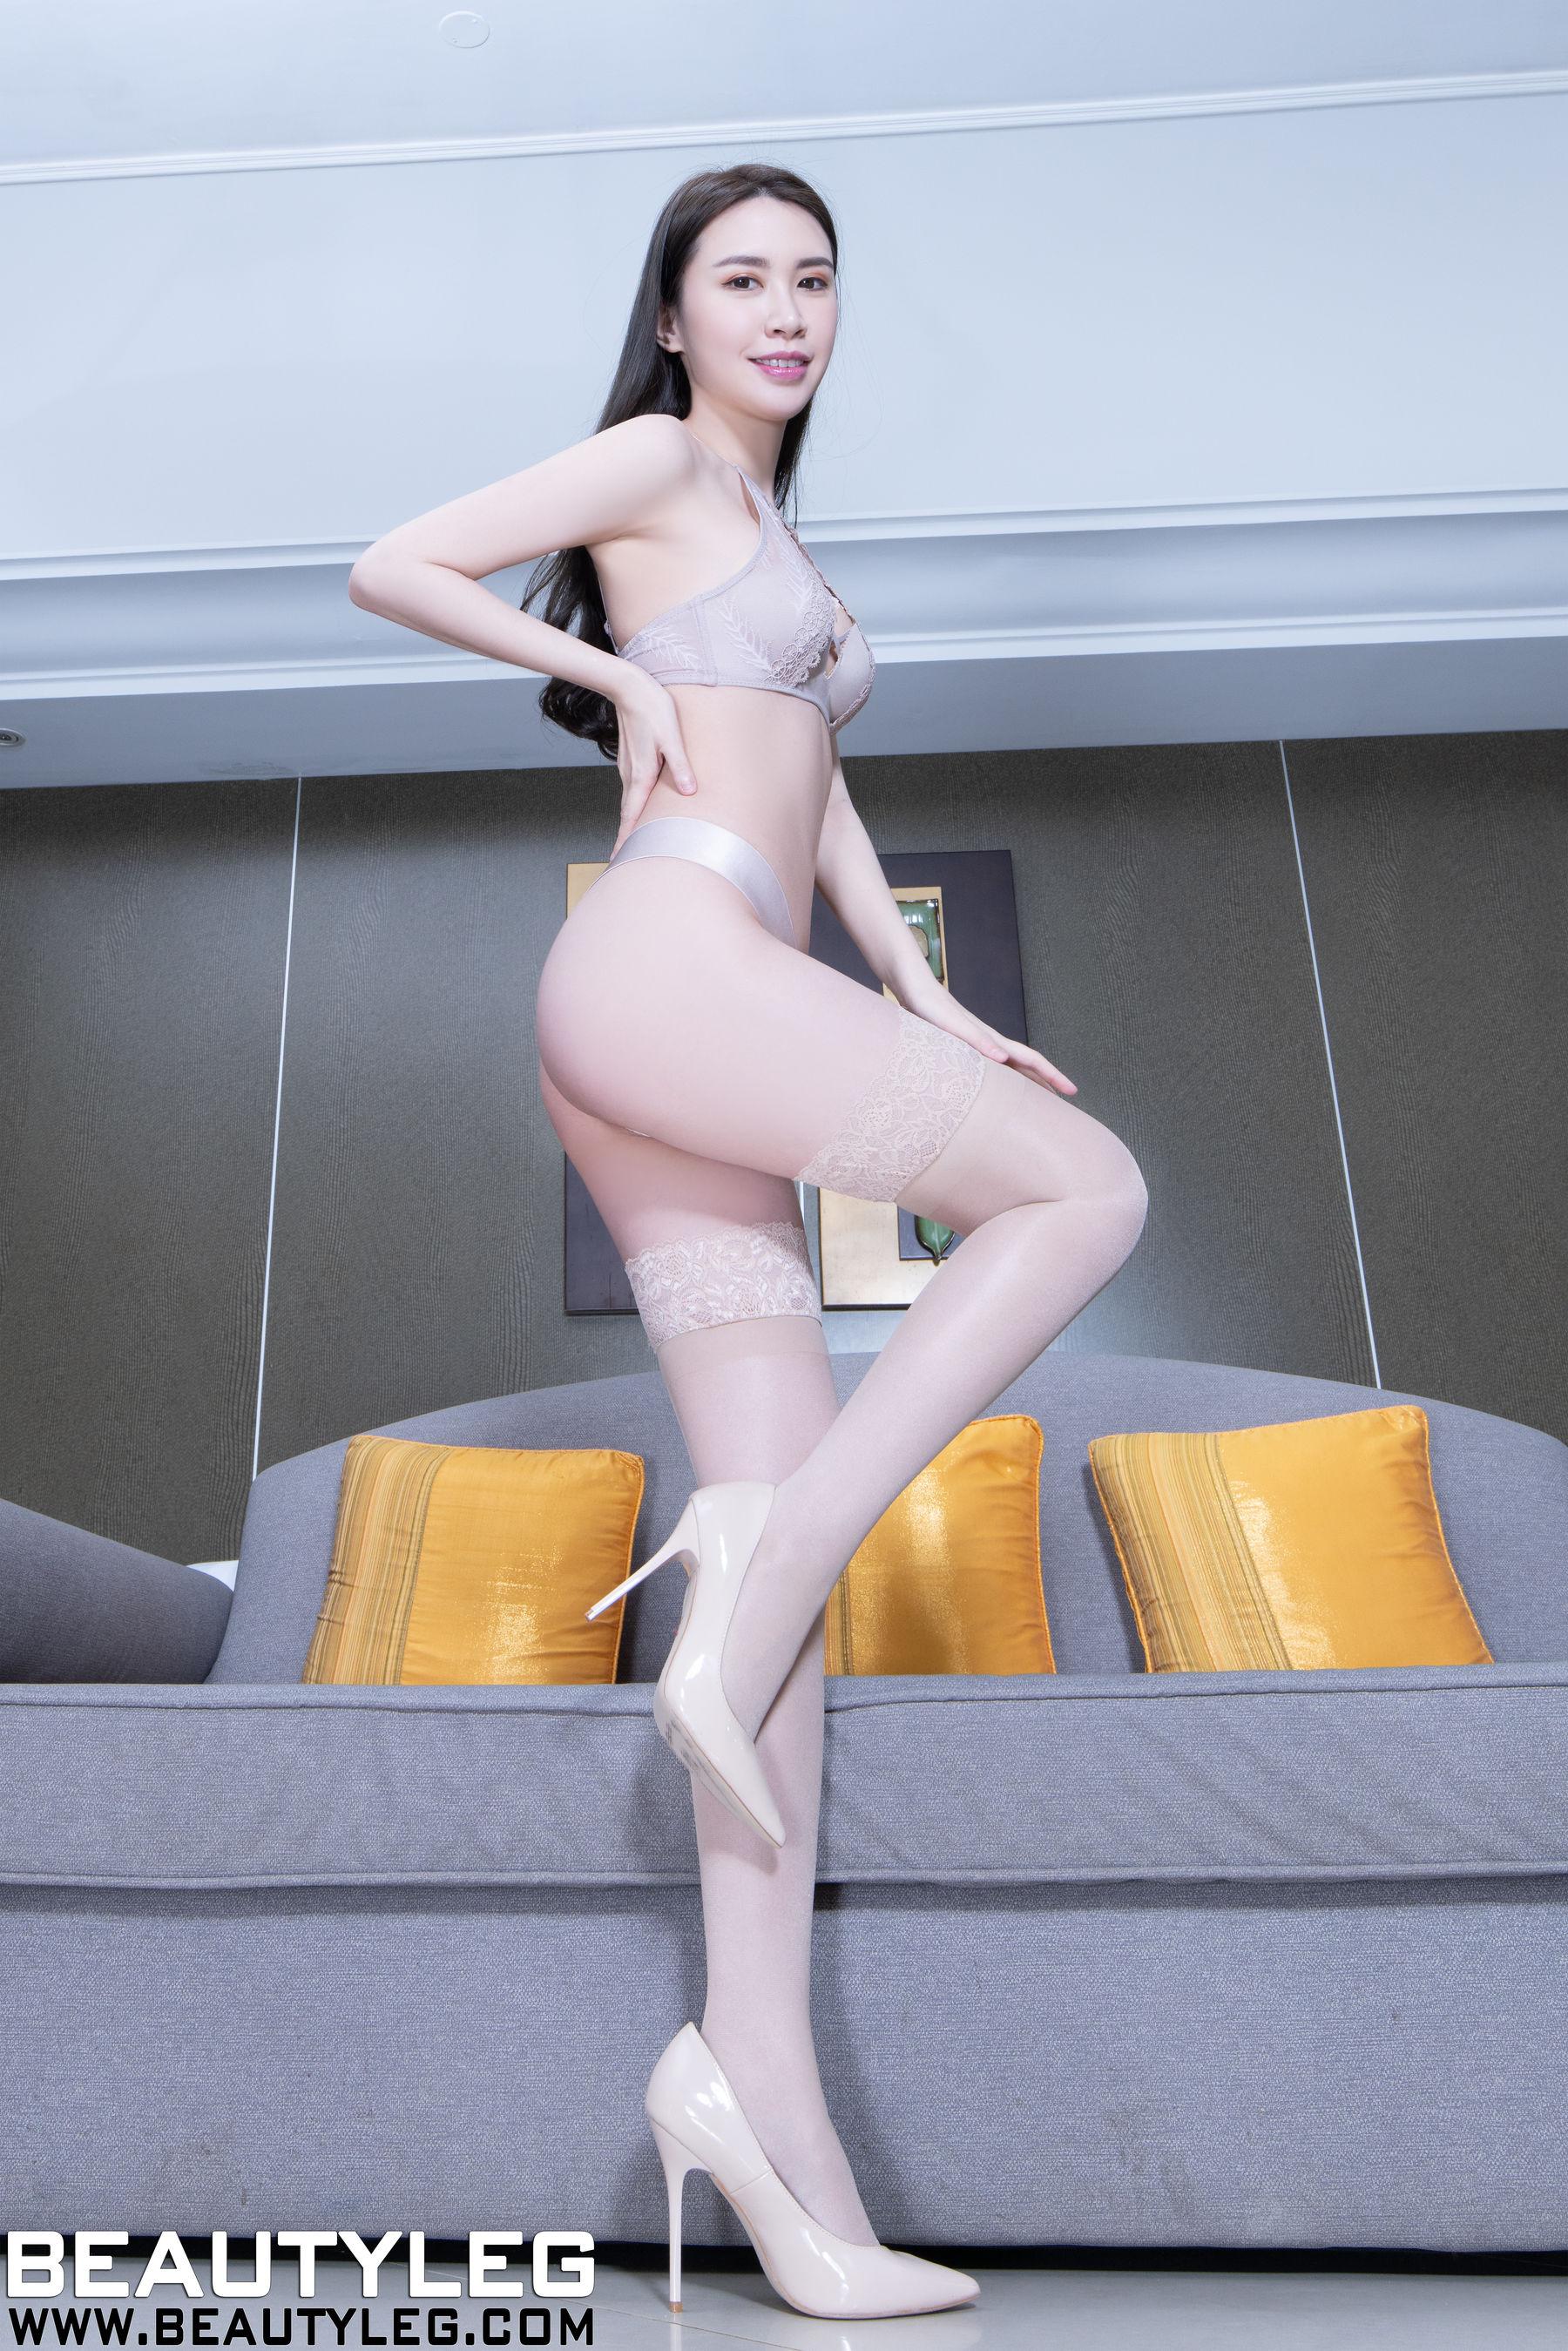 VOL.285 [Beautyleg]内衣美女:崔多朵(崔德蓉,腿模Stephy)超高清个人性感漂亮大图(43P)